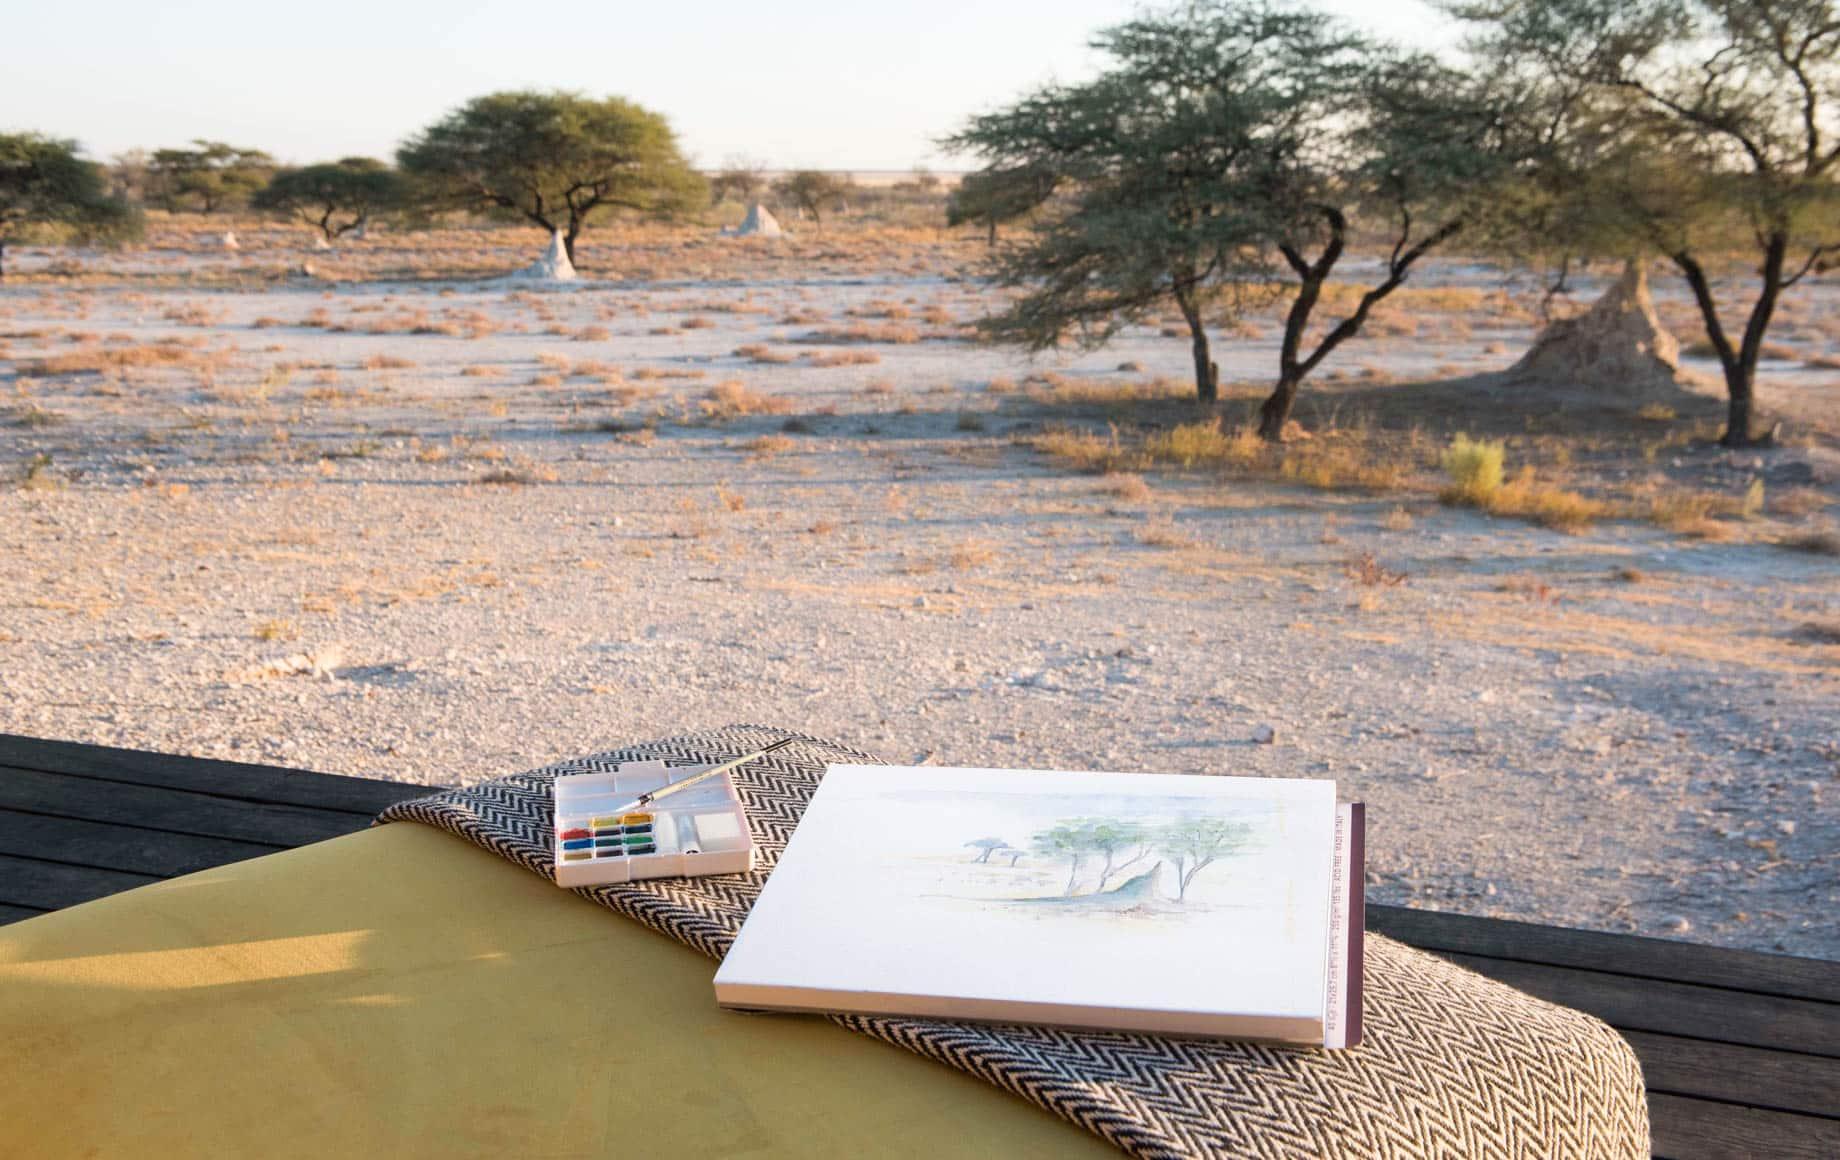 Sketchbook on chair near Africa plains